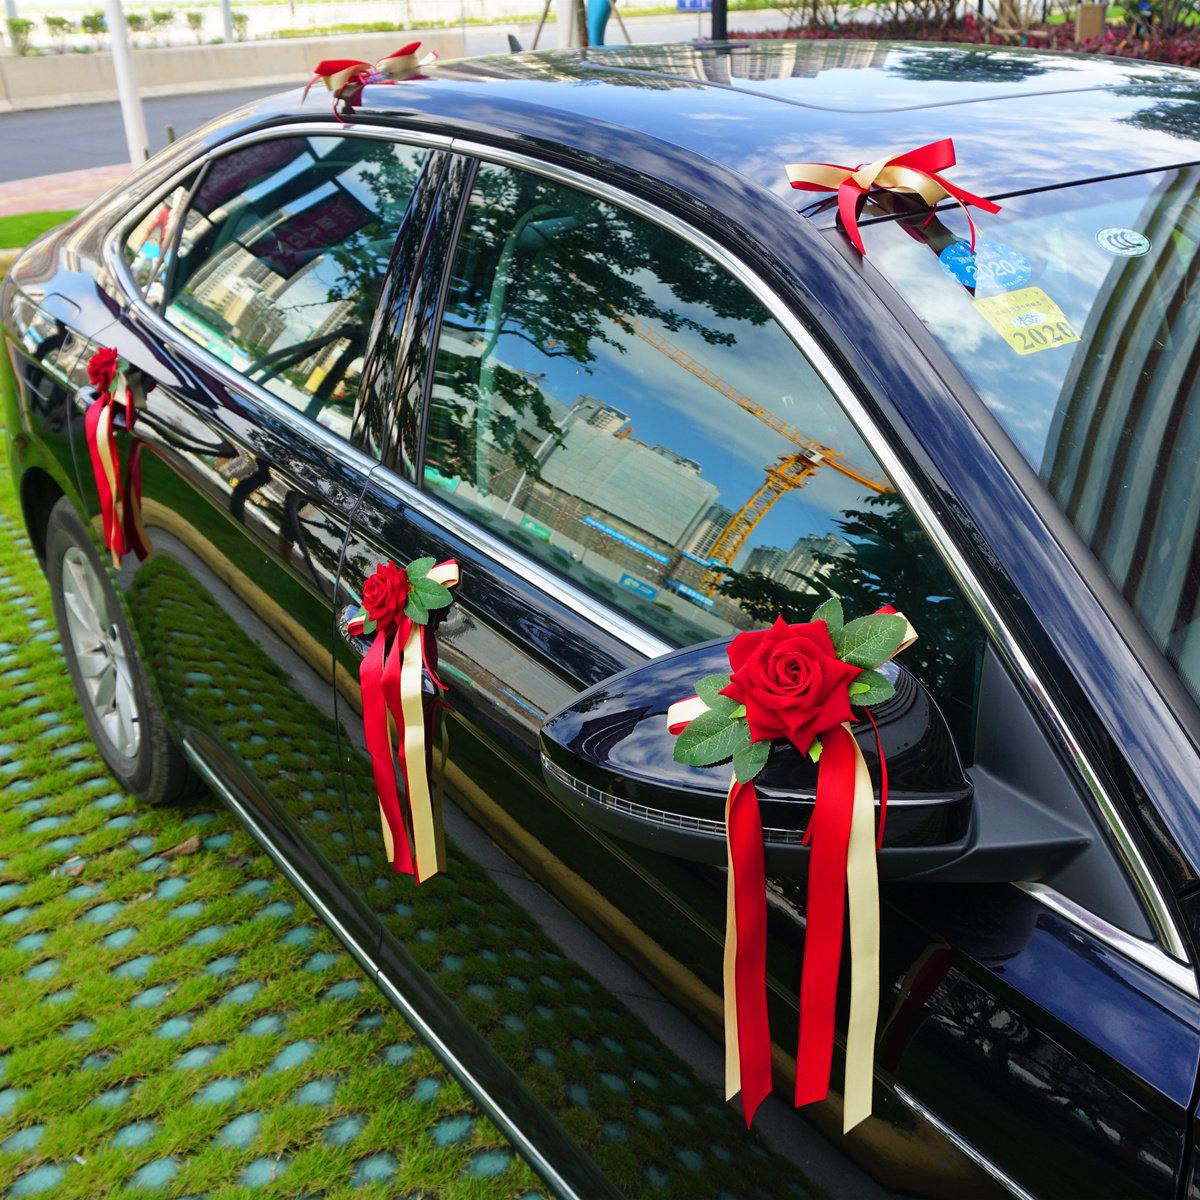 Mori tie wedding car flower decoration simulation flower wedding team decoration flower set handle pull flower butterfly flower